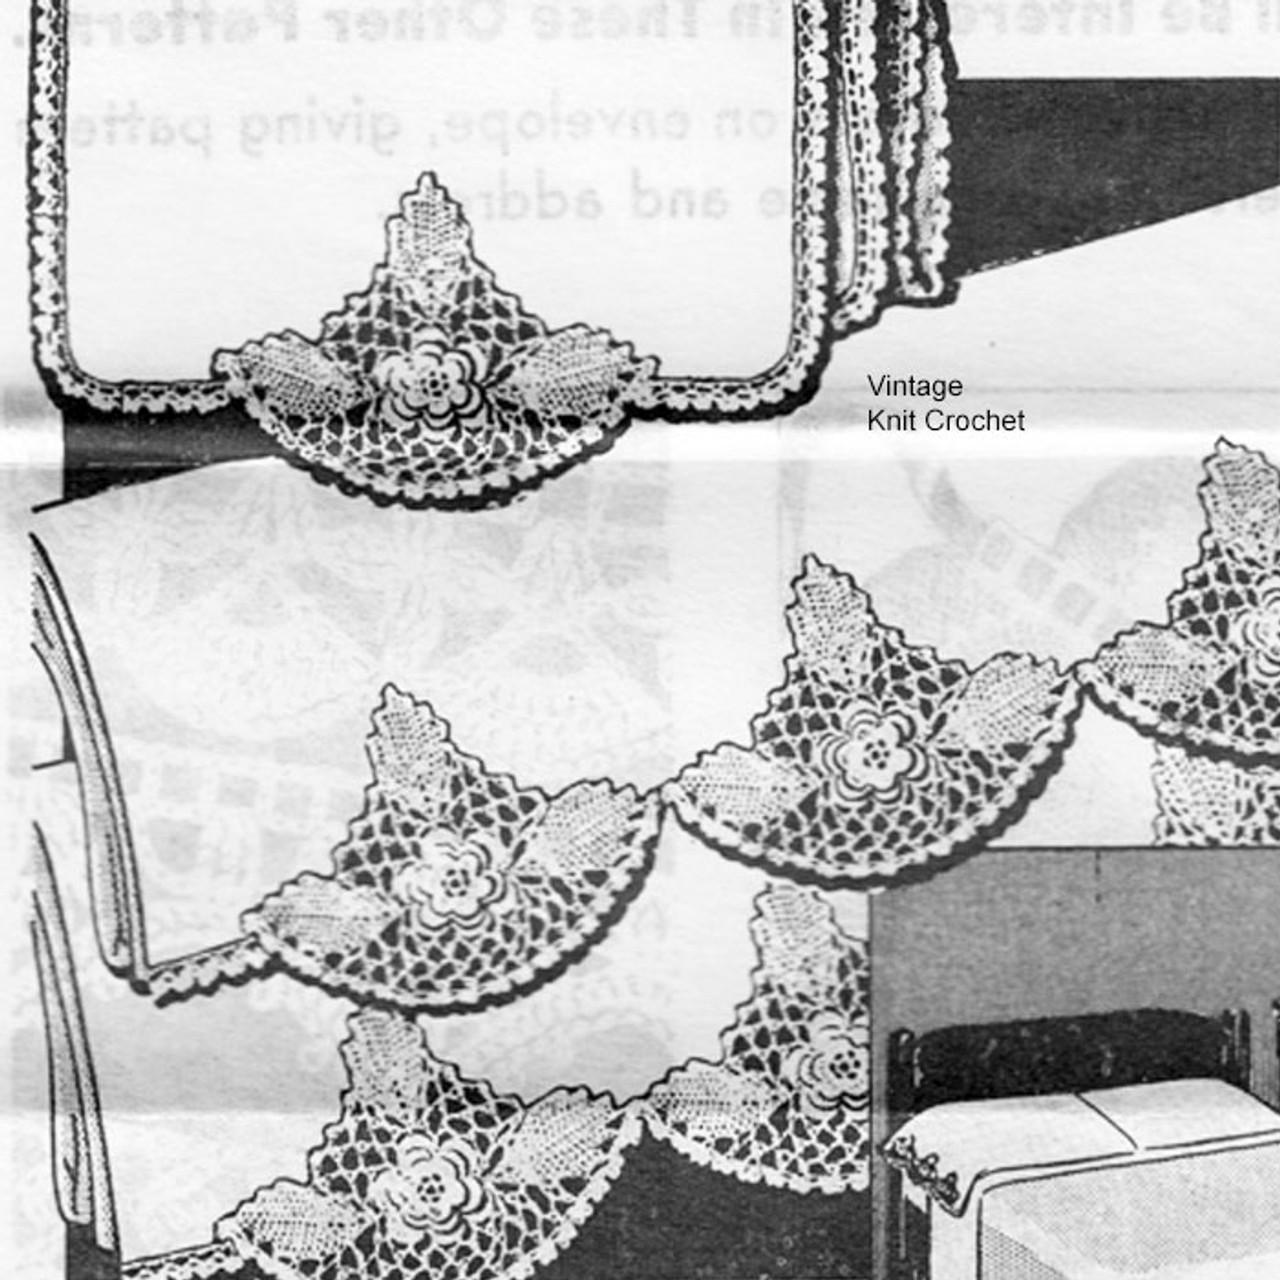 Mail Order Irish Rose Crochet Insert No R-2639